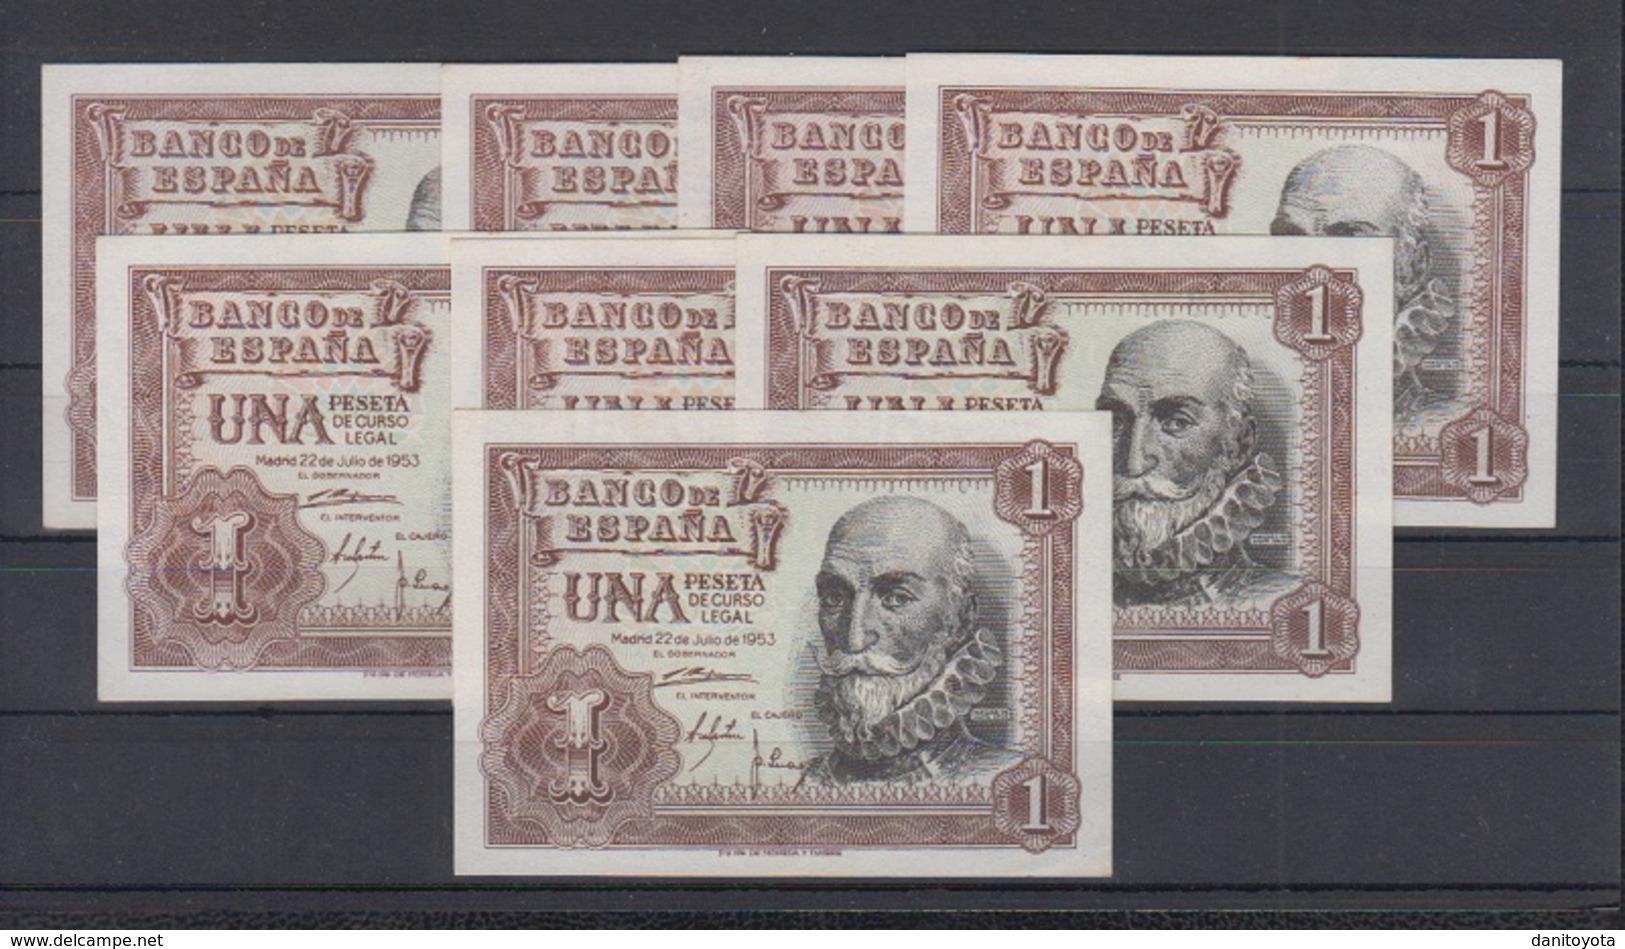 EDIFIL 465a.  1 PTA 22 DE JULIO DE 1953.   LOTE DE 8 BILLETES. - [ 3] 1936-1975 : Régence De Franco